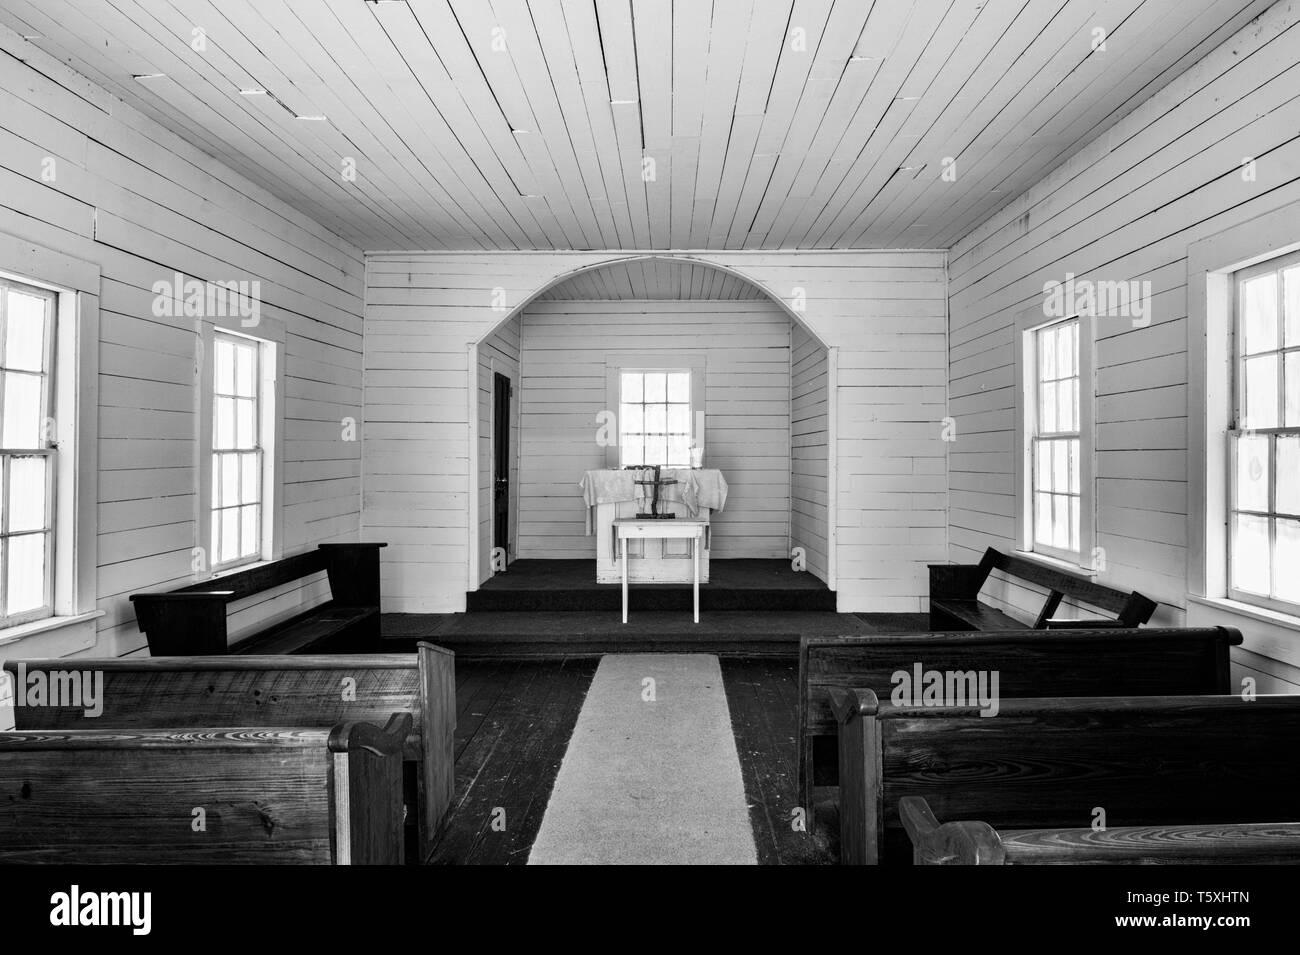 First African Baptist Church, Cumberland Island, Georgia - Stock Image